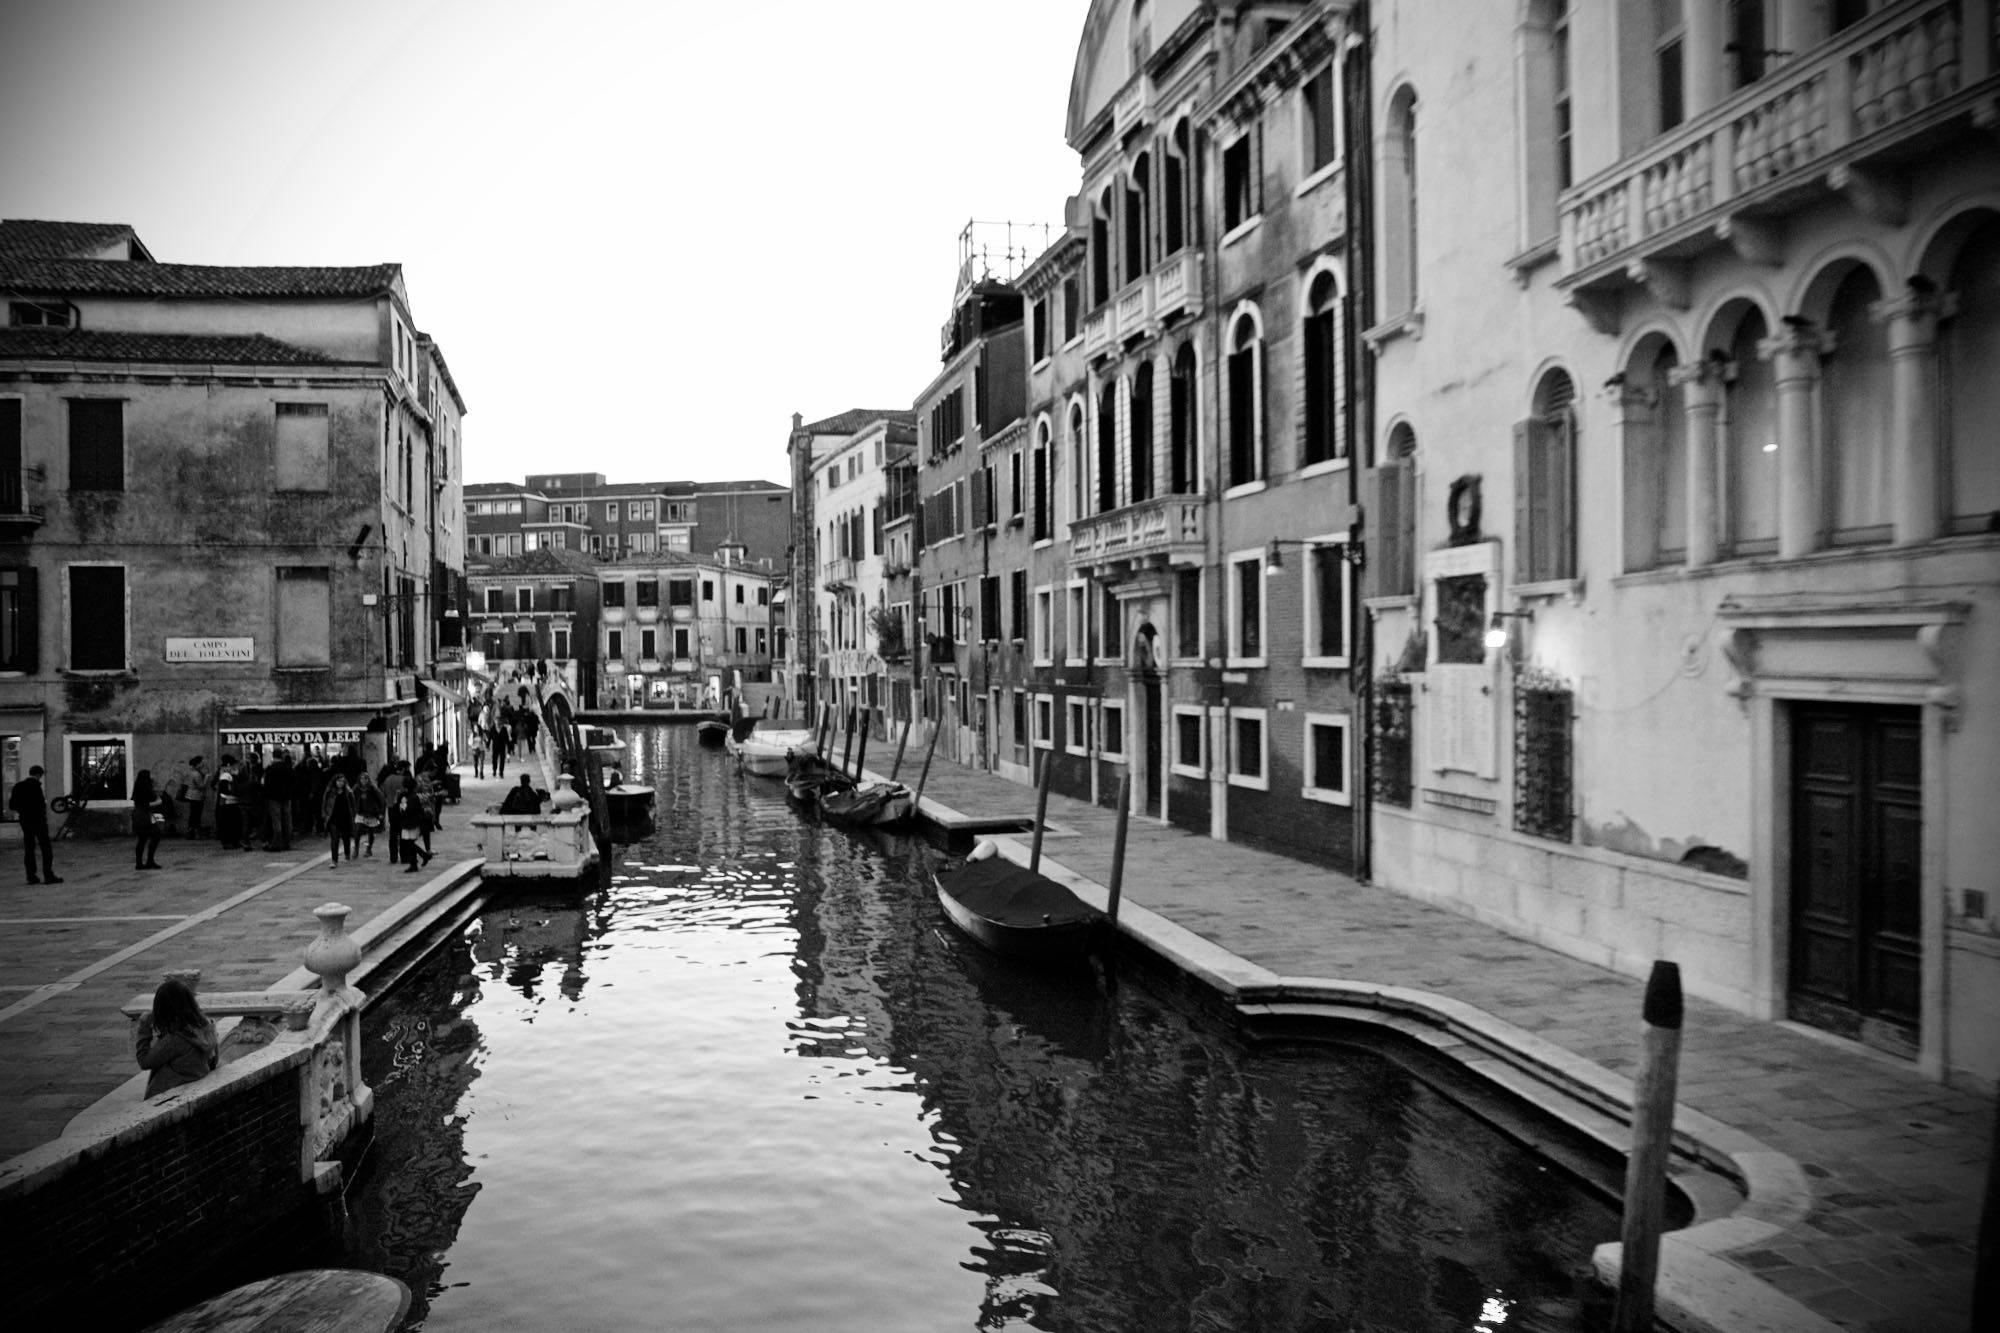 Massimiliano Scarpa photographer_Venezia_2015 -54163